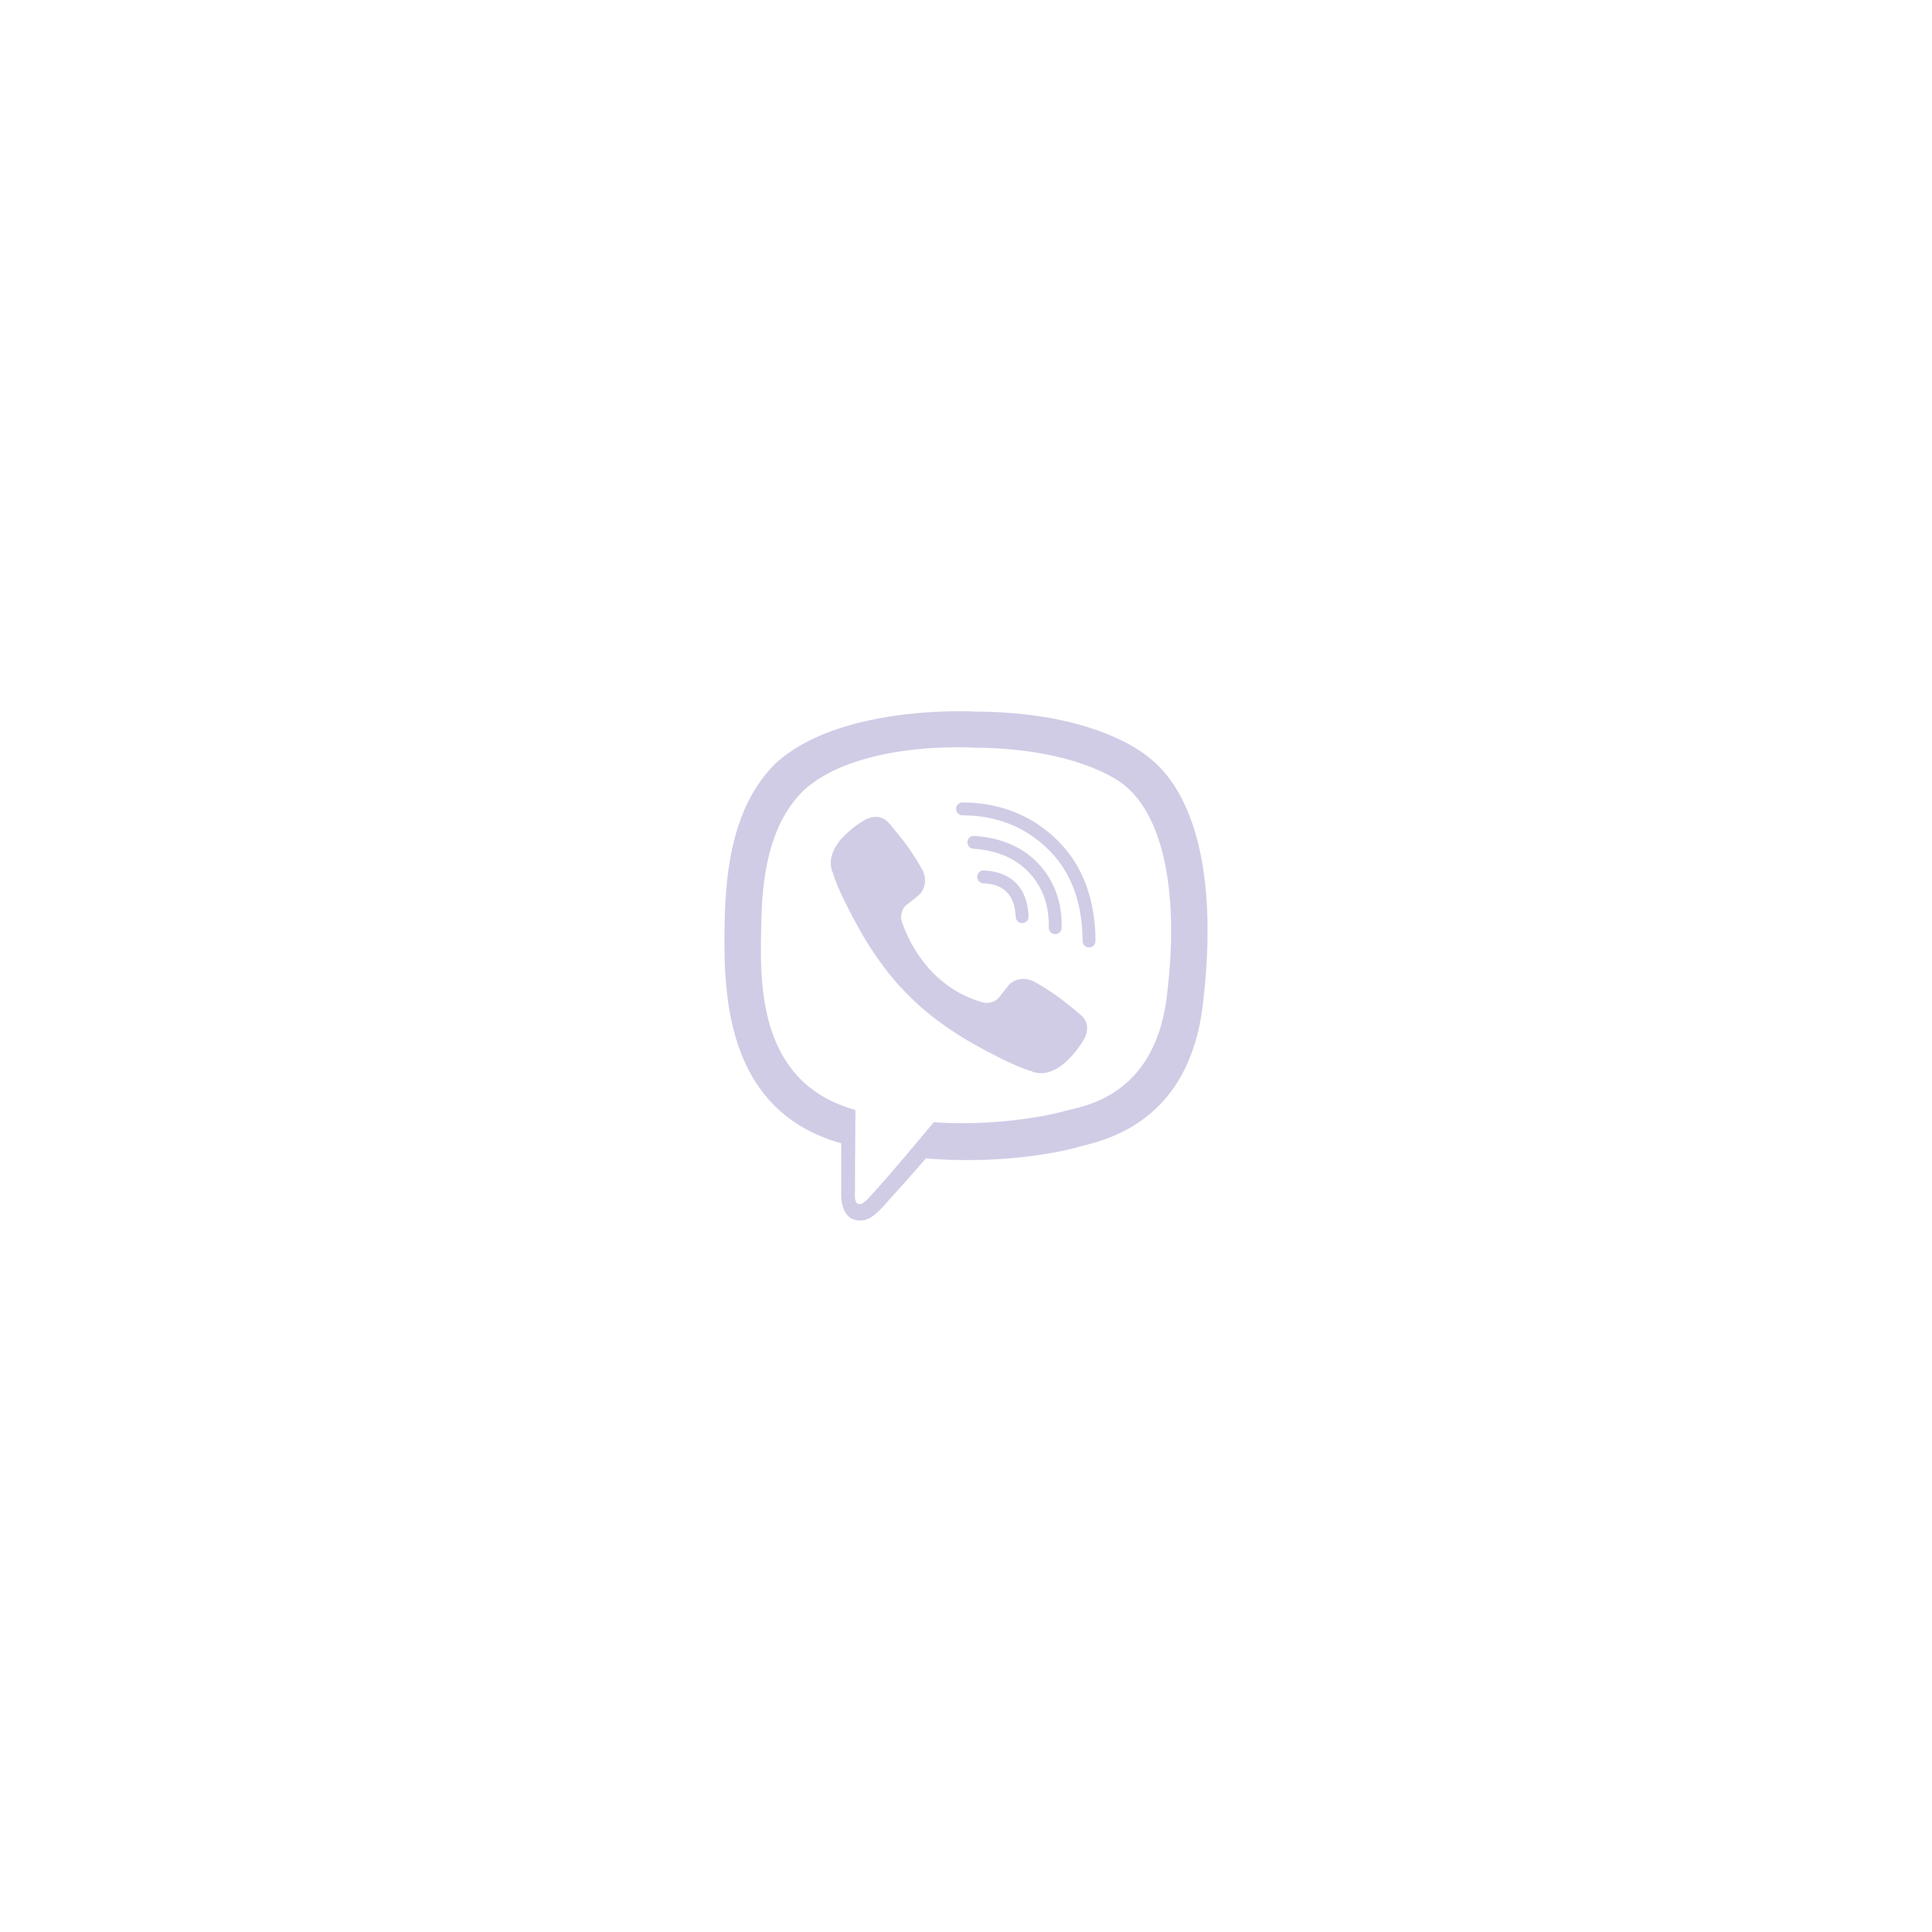 viber planable customer logo